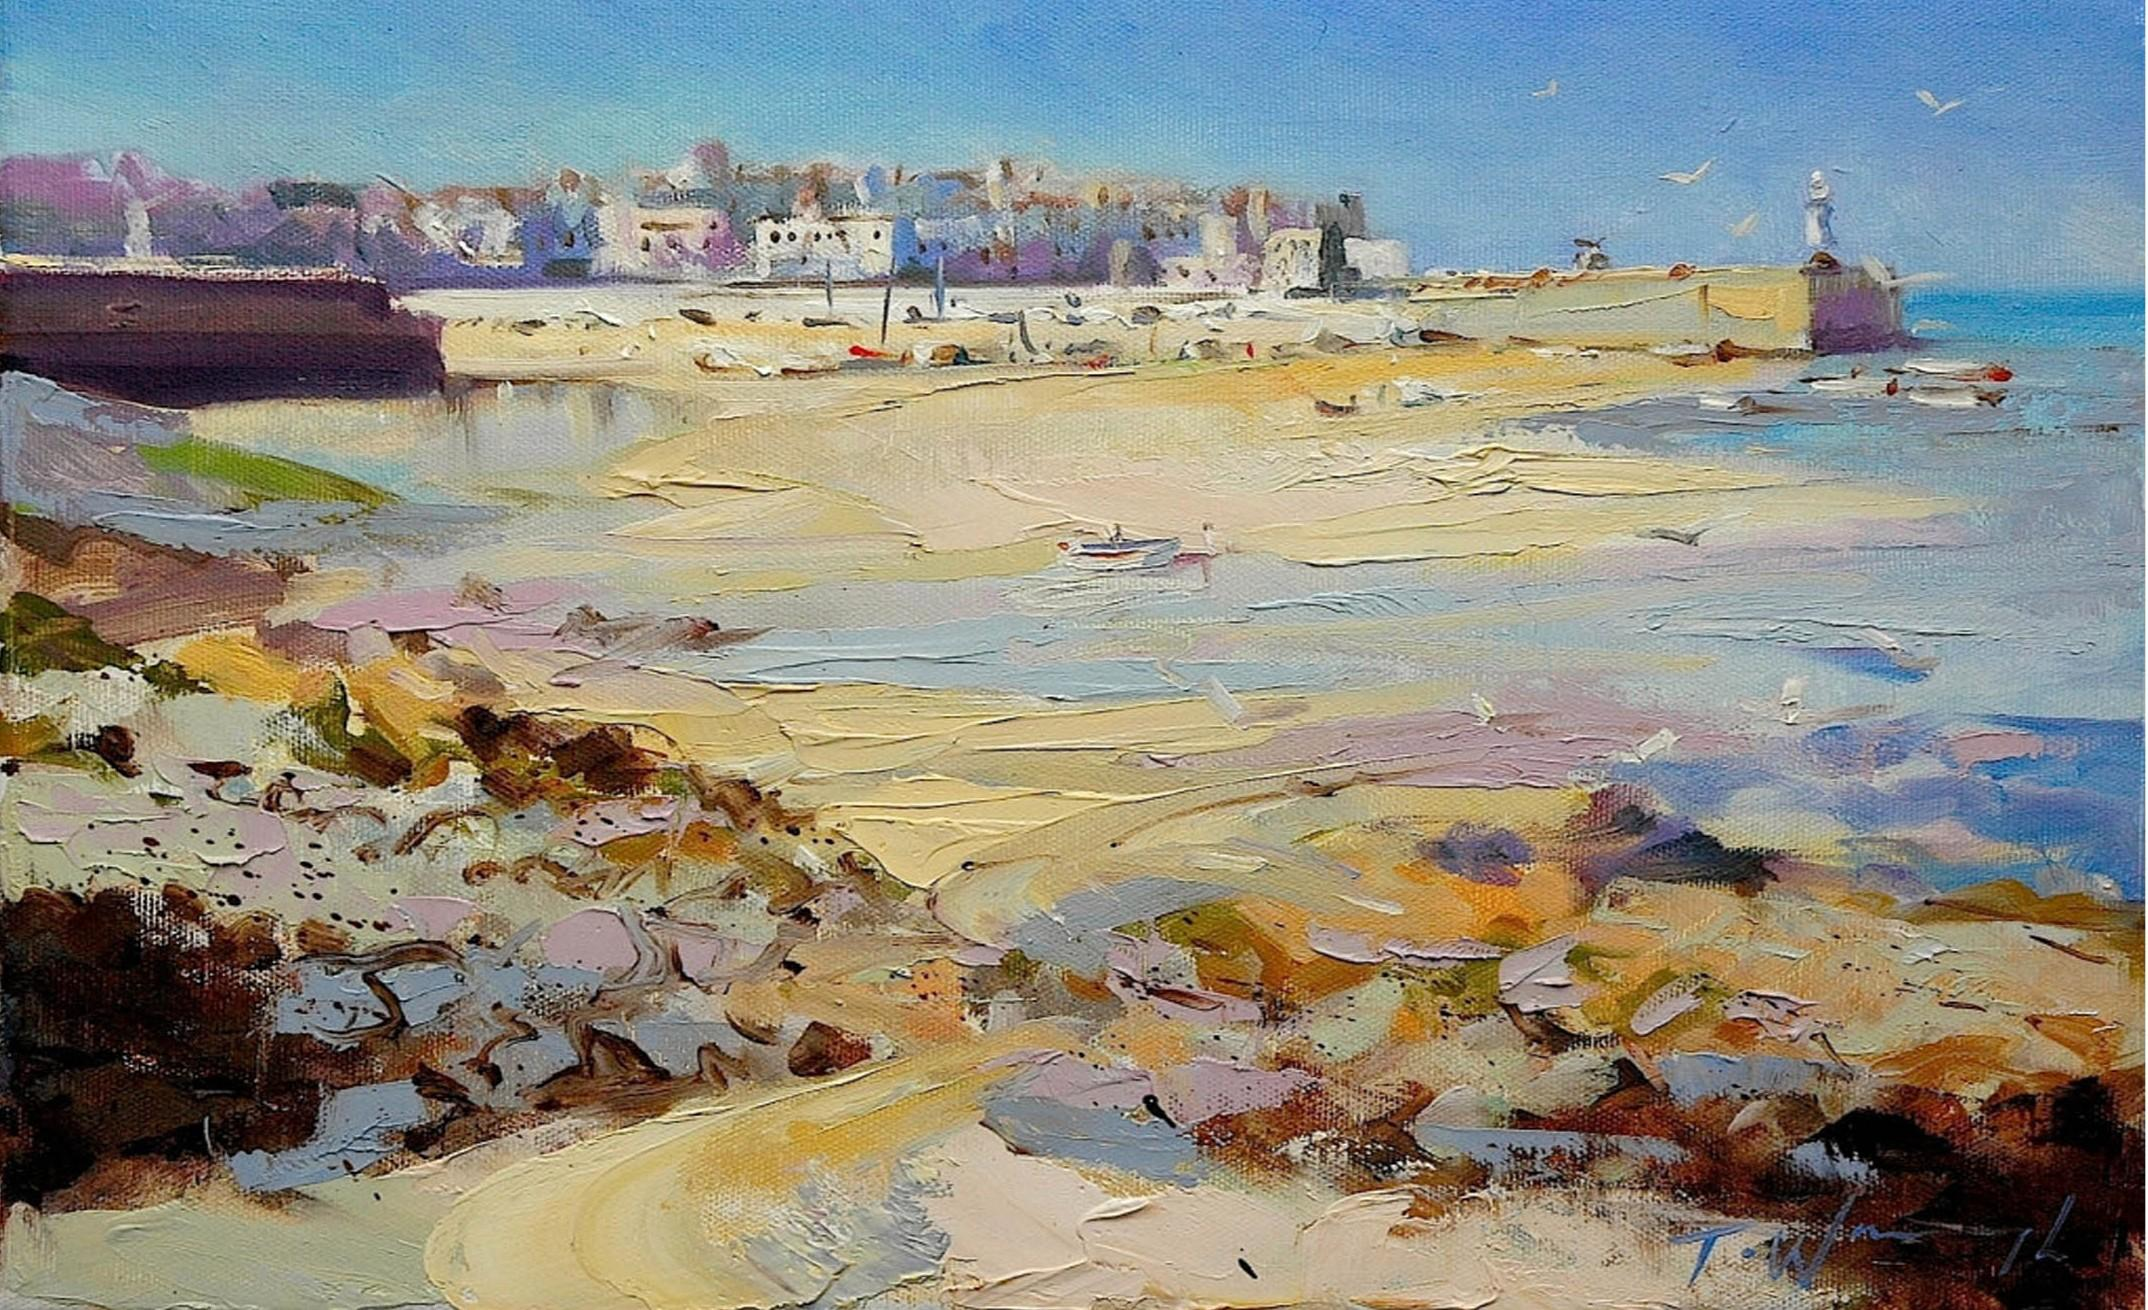 St Ives, Cornwall, Trevor Waugh, Bright Beach Art, Original Painting, Seascape